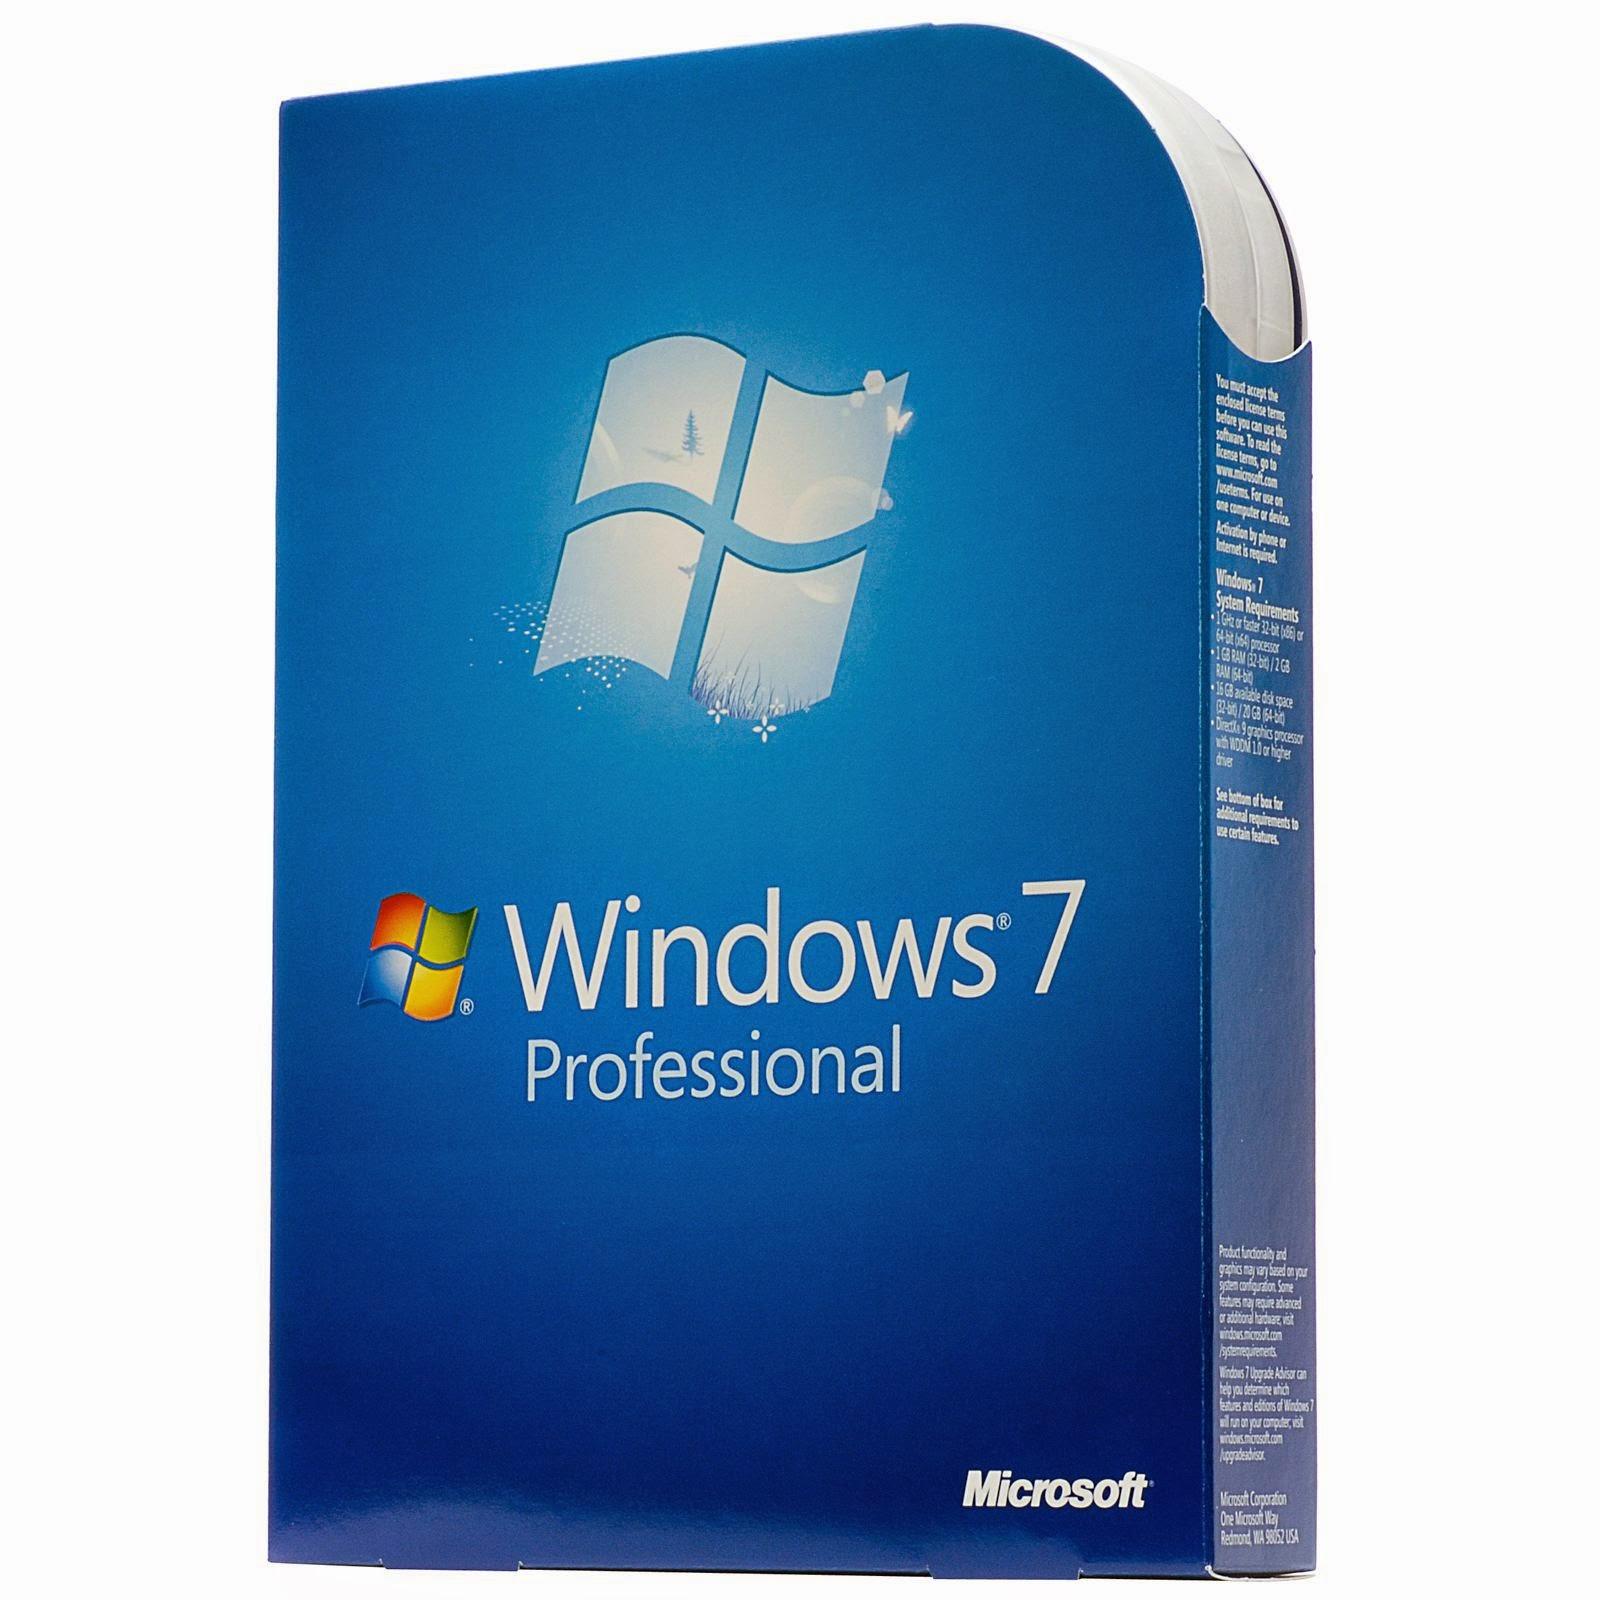 تحميل Windows 7 Professional 32 Bit 64 Bit برابط مباشر